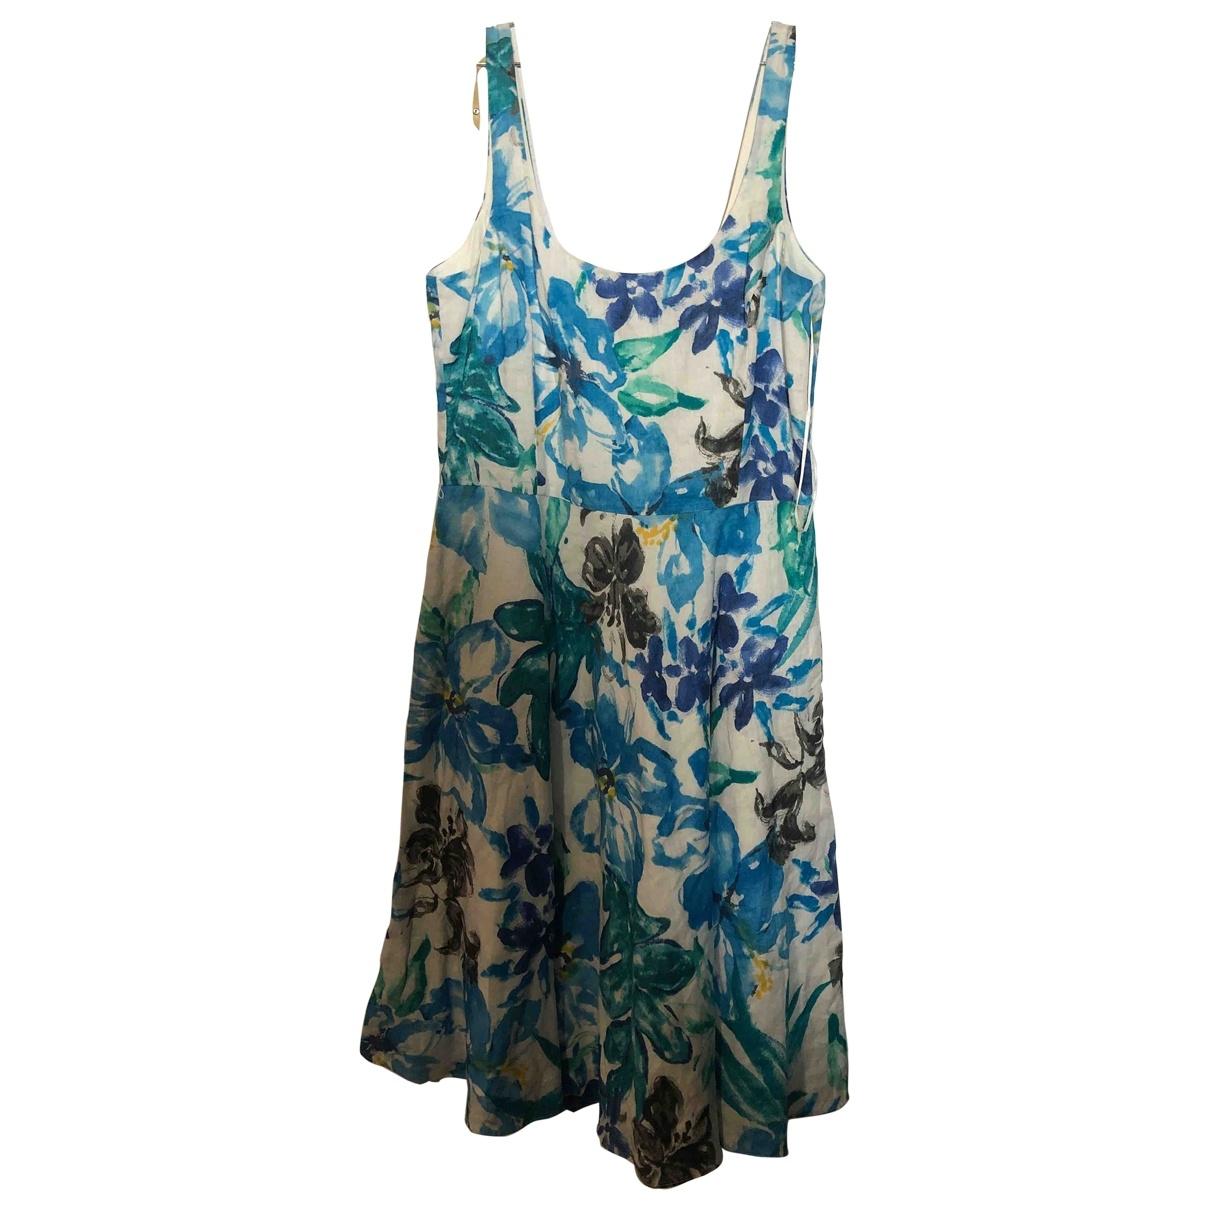 Lauren Ralph Lauren \N Multicolour Linen dress for Women M International